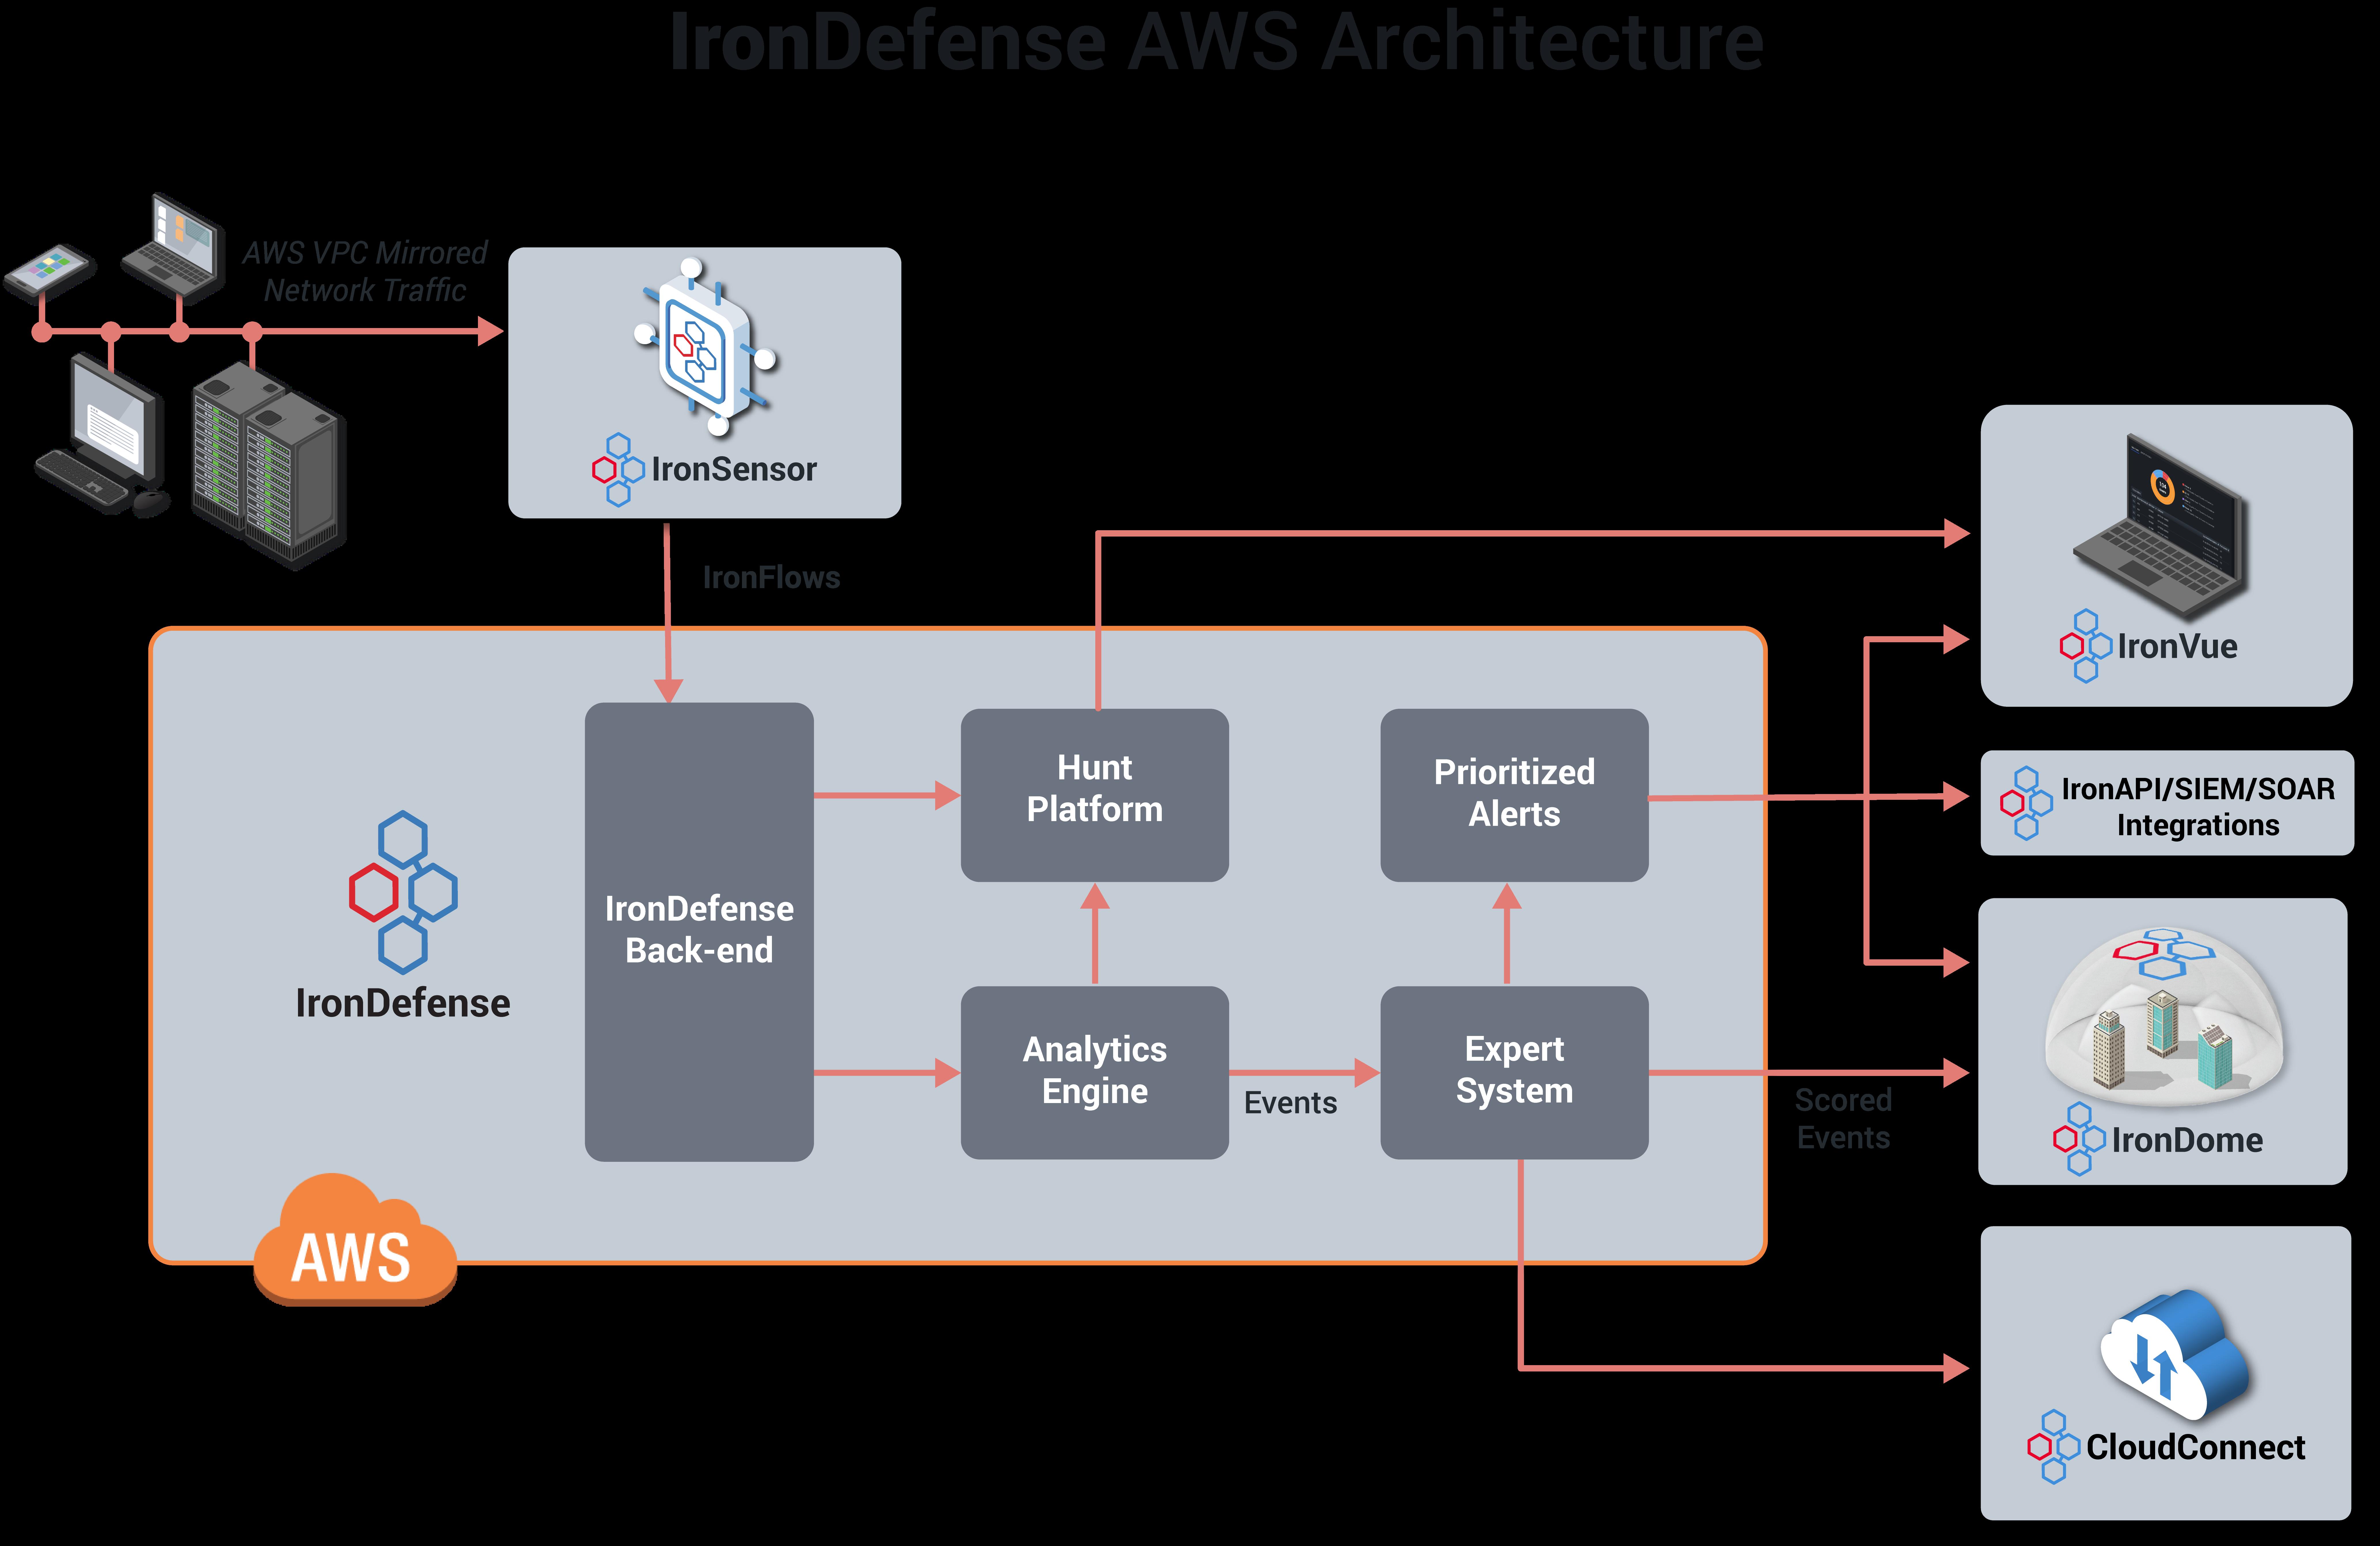 AWS_IronDefense Architecture_isometric icons_002